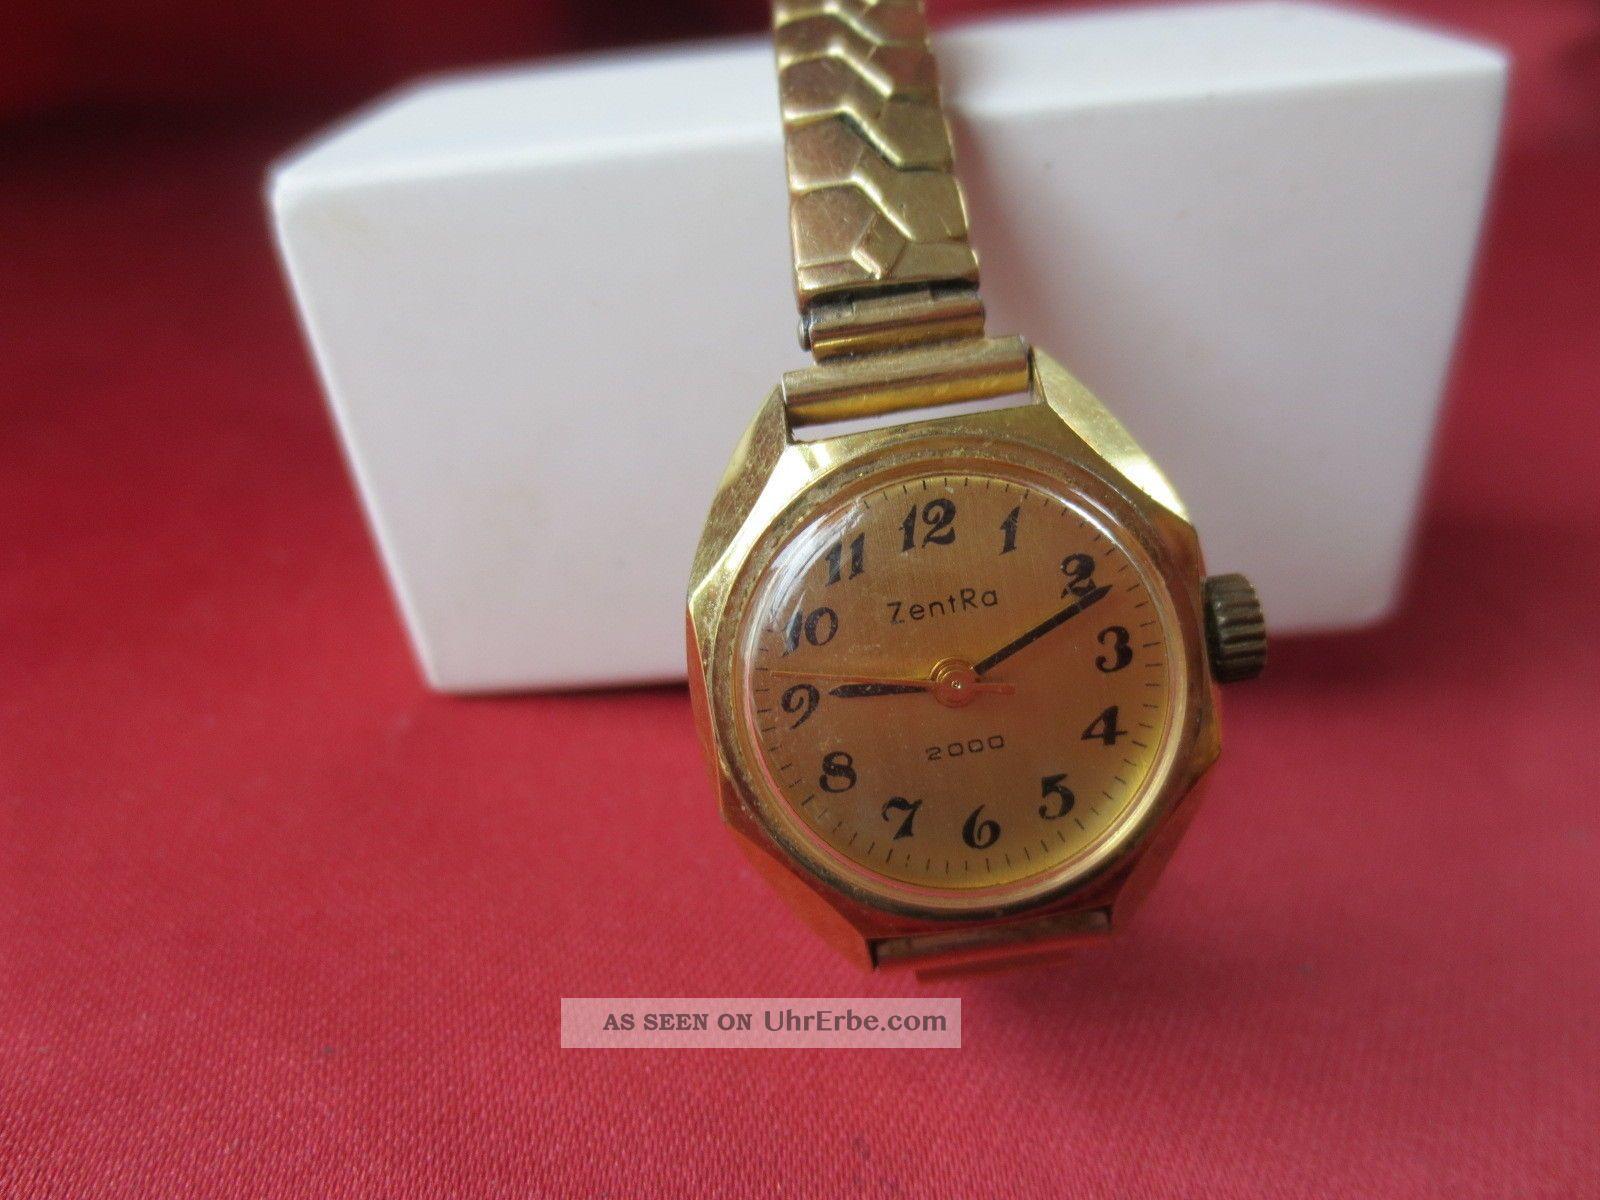 Zentra 2000 Armbanduhr - 17 Jewels - Mechanischer Handaufzug - Vintage Armbanduhren Bild